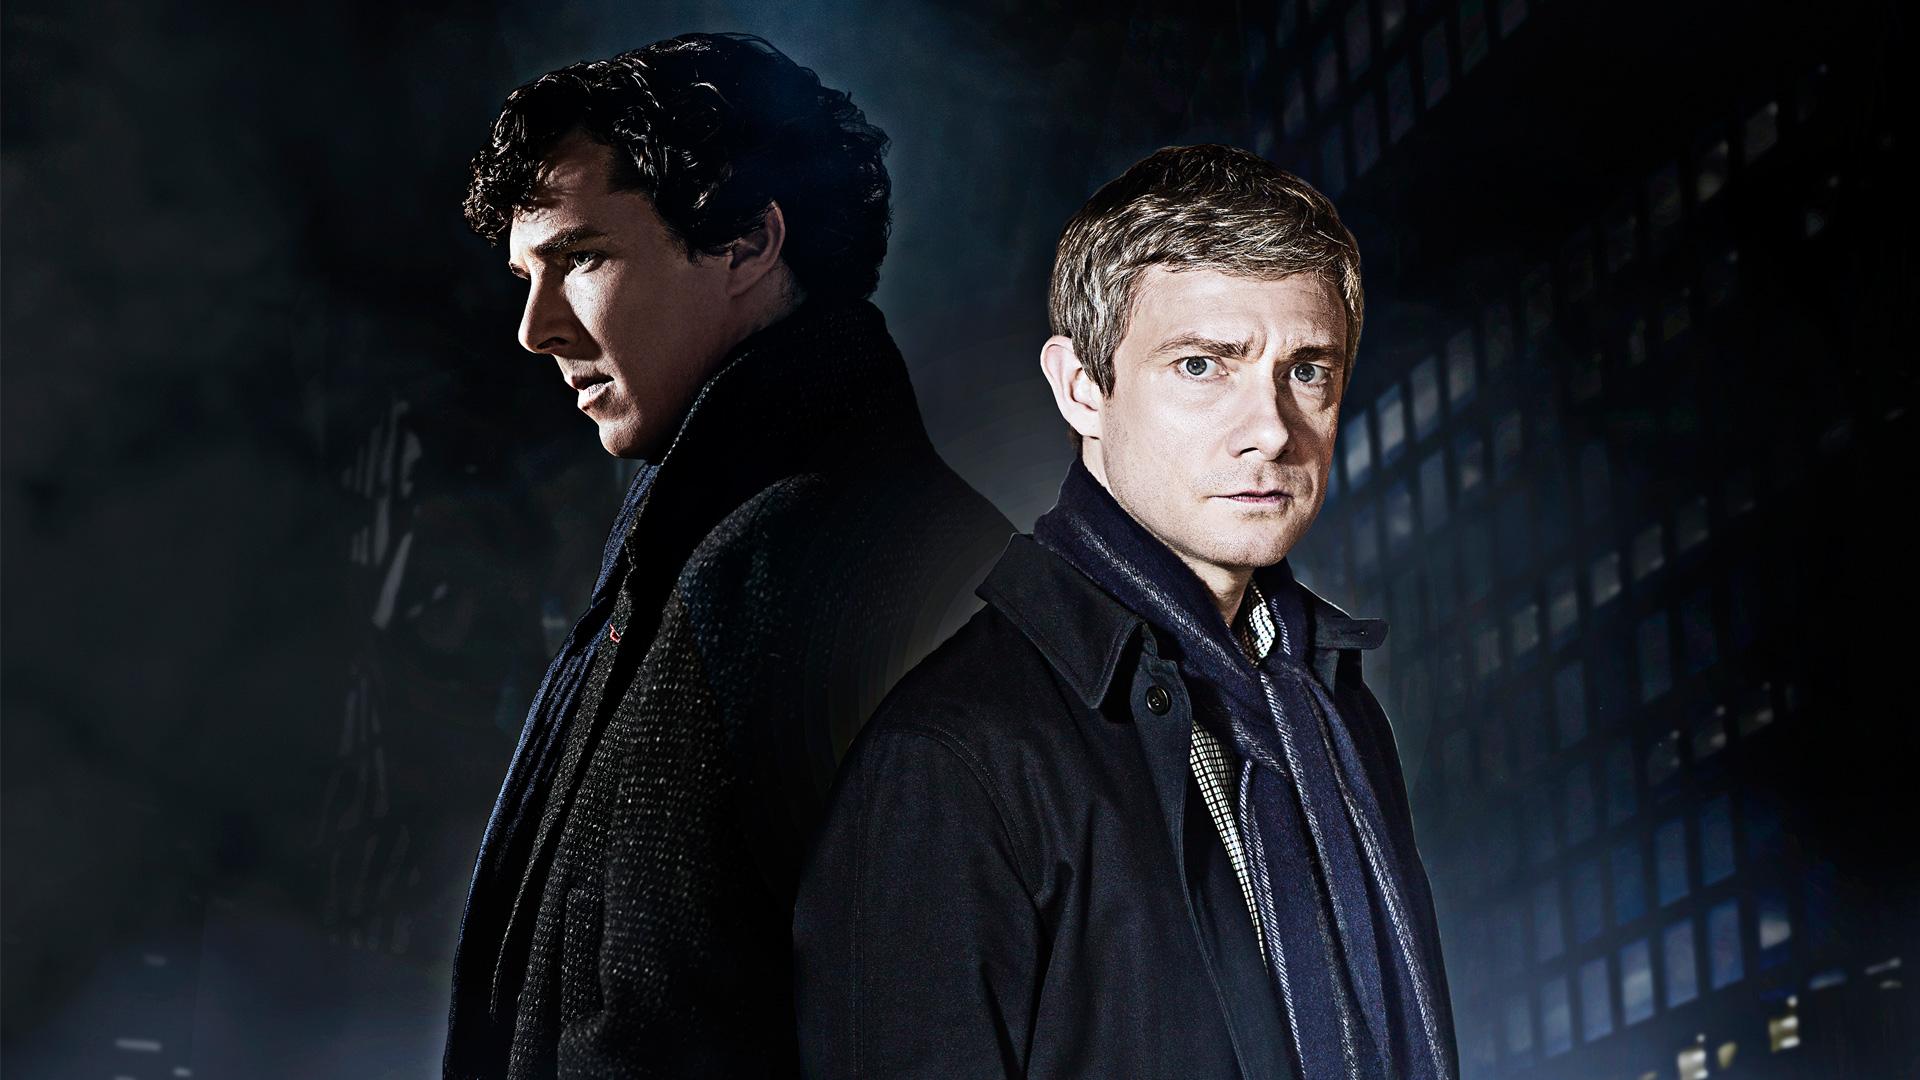 Sherlock Holmes Adventure HD v1.0.1 Immagini